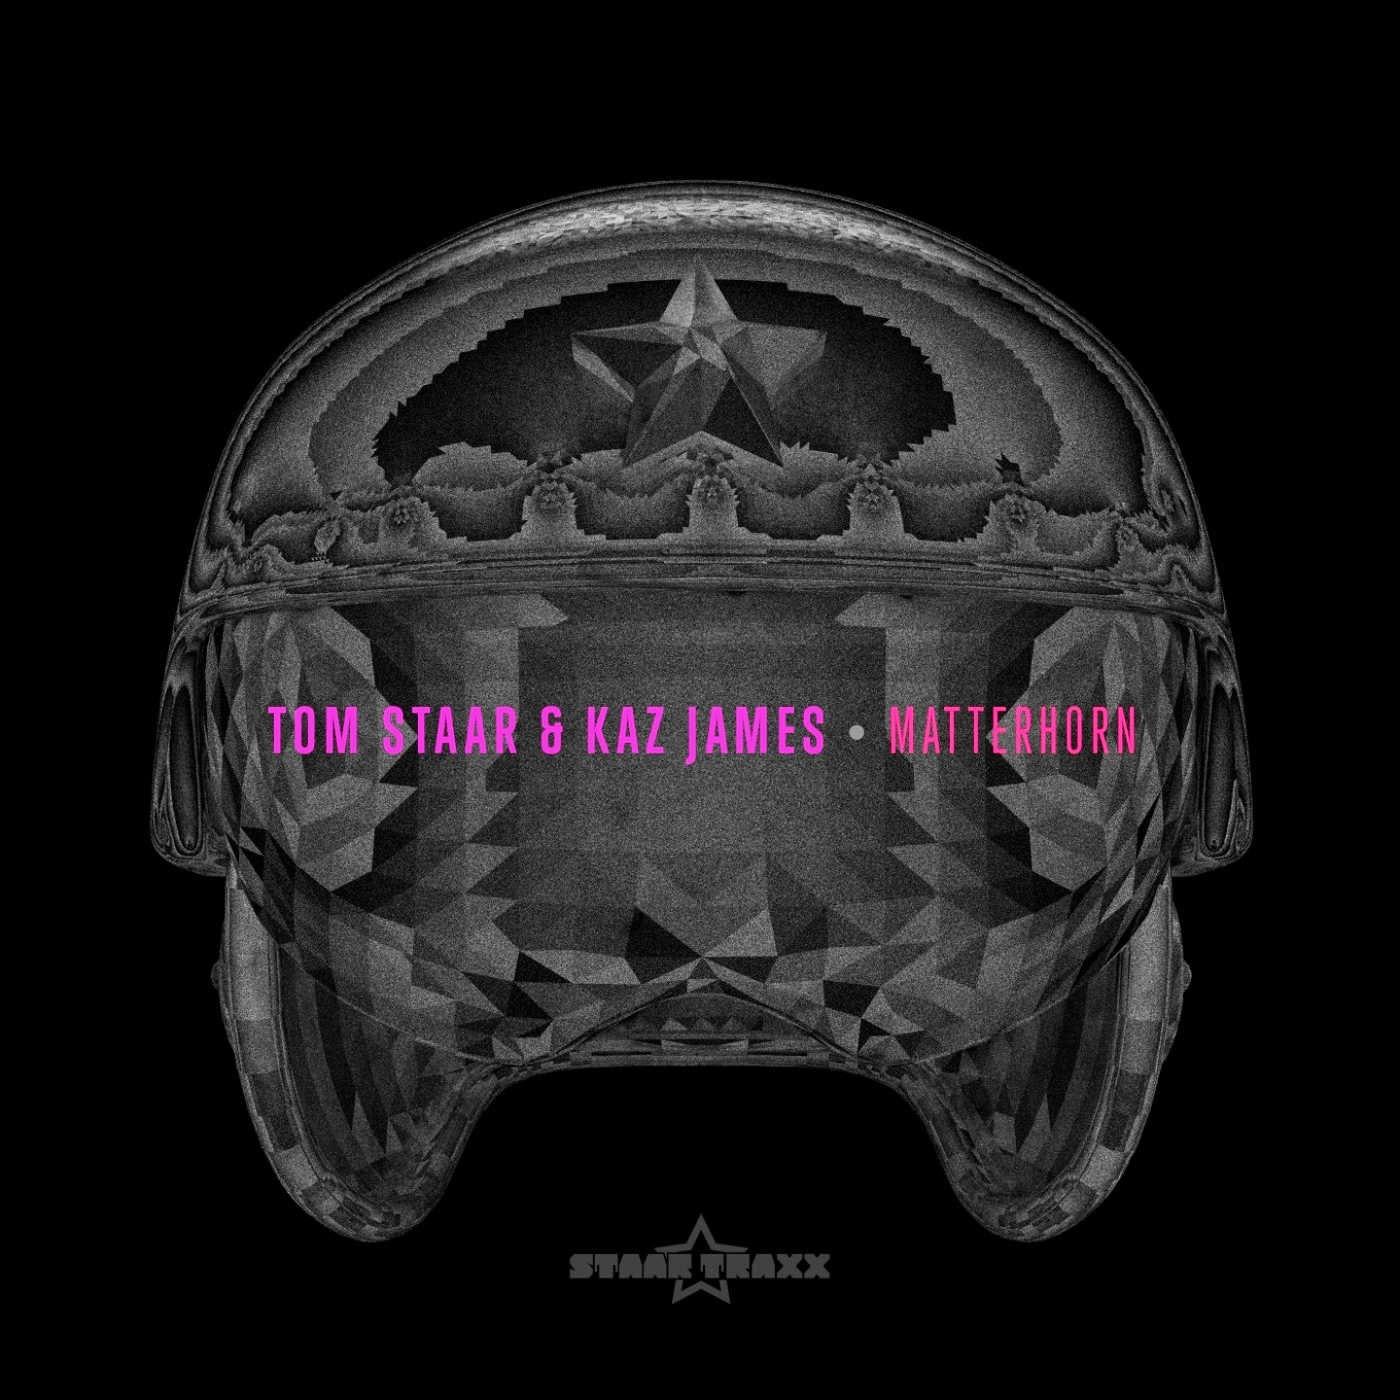 Tom Staar & Kaz James - Matterhorn - Single  Cover